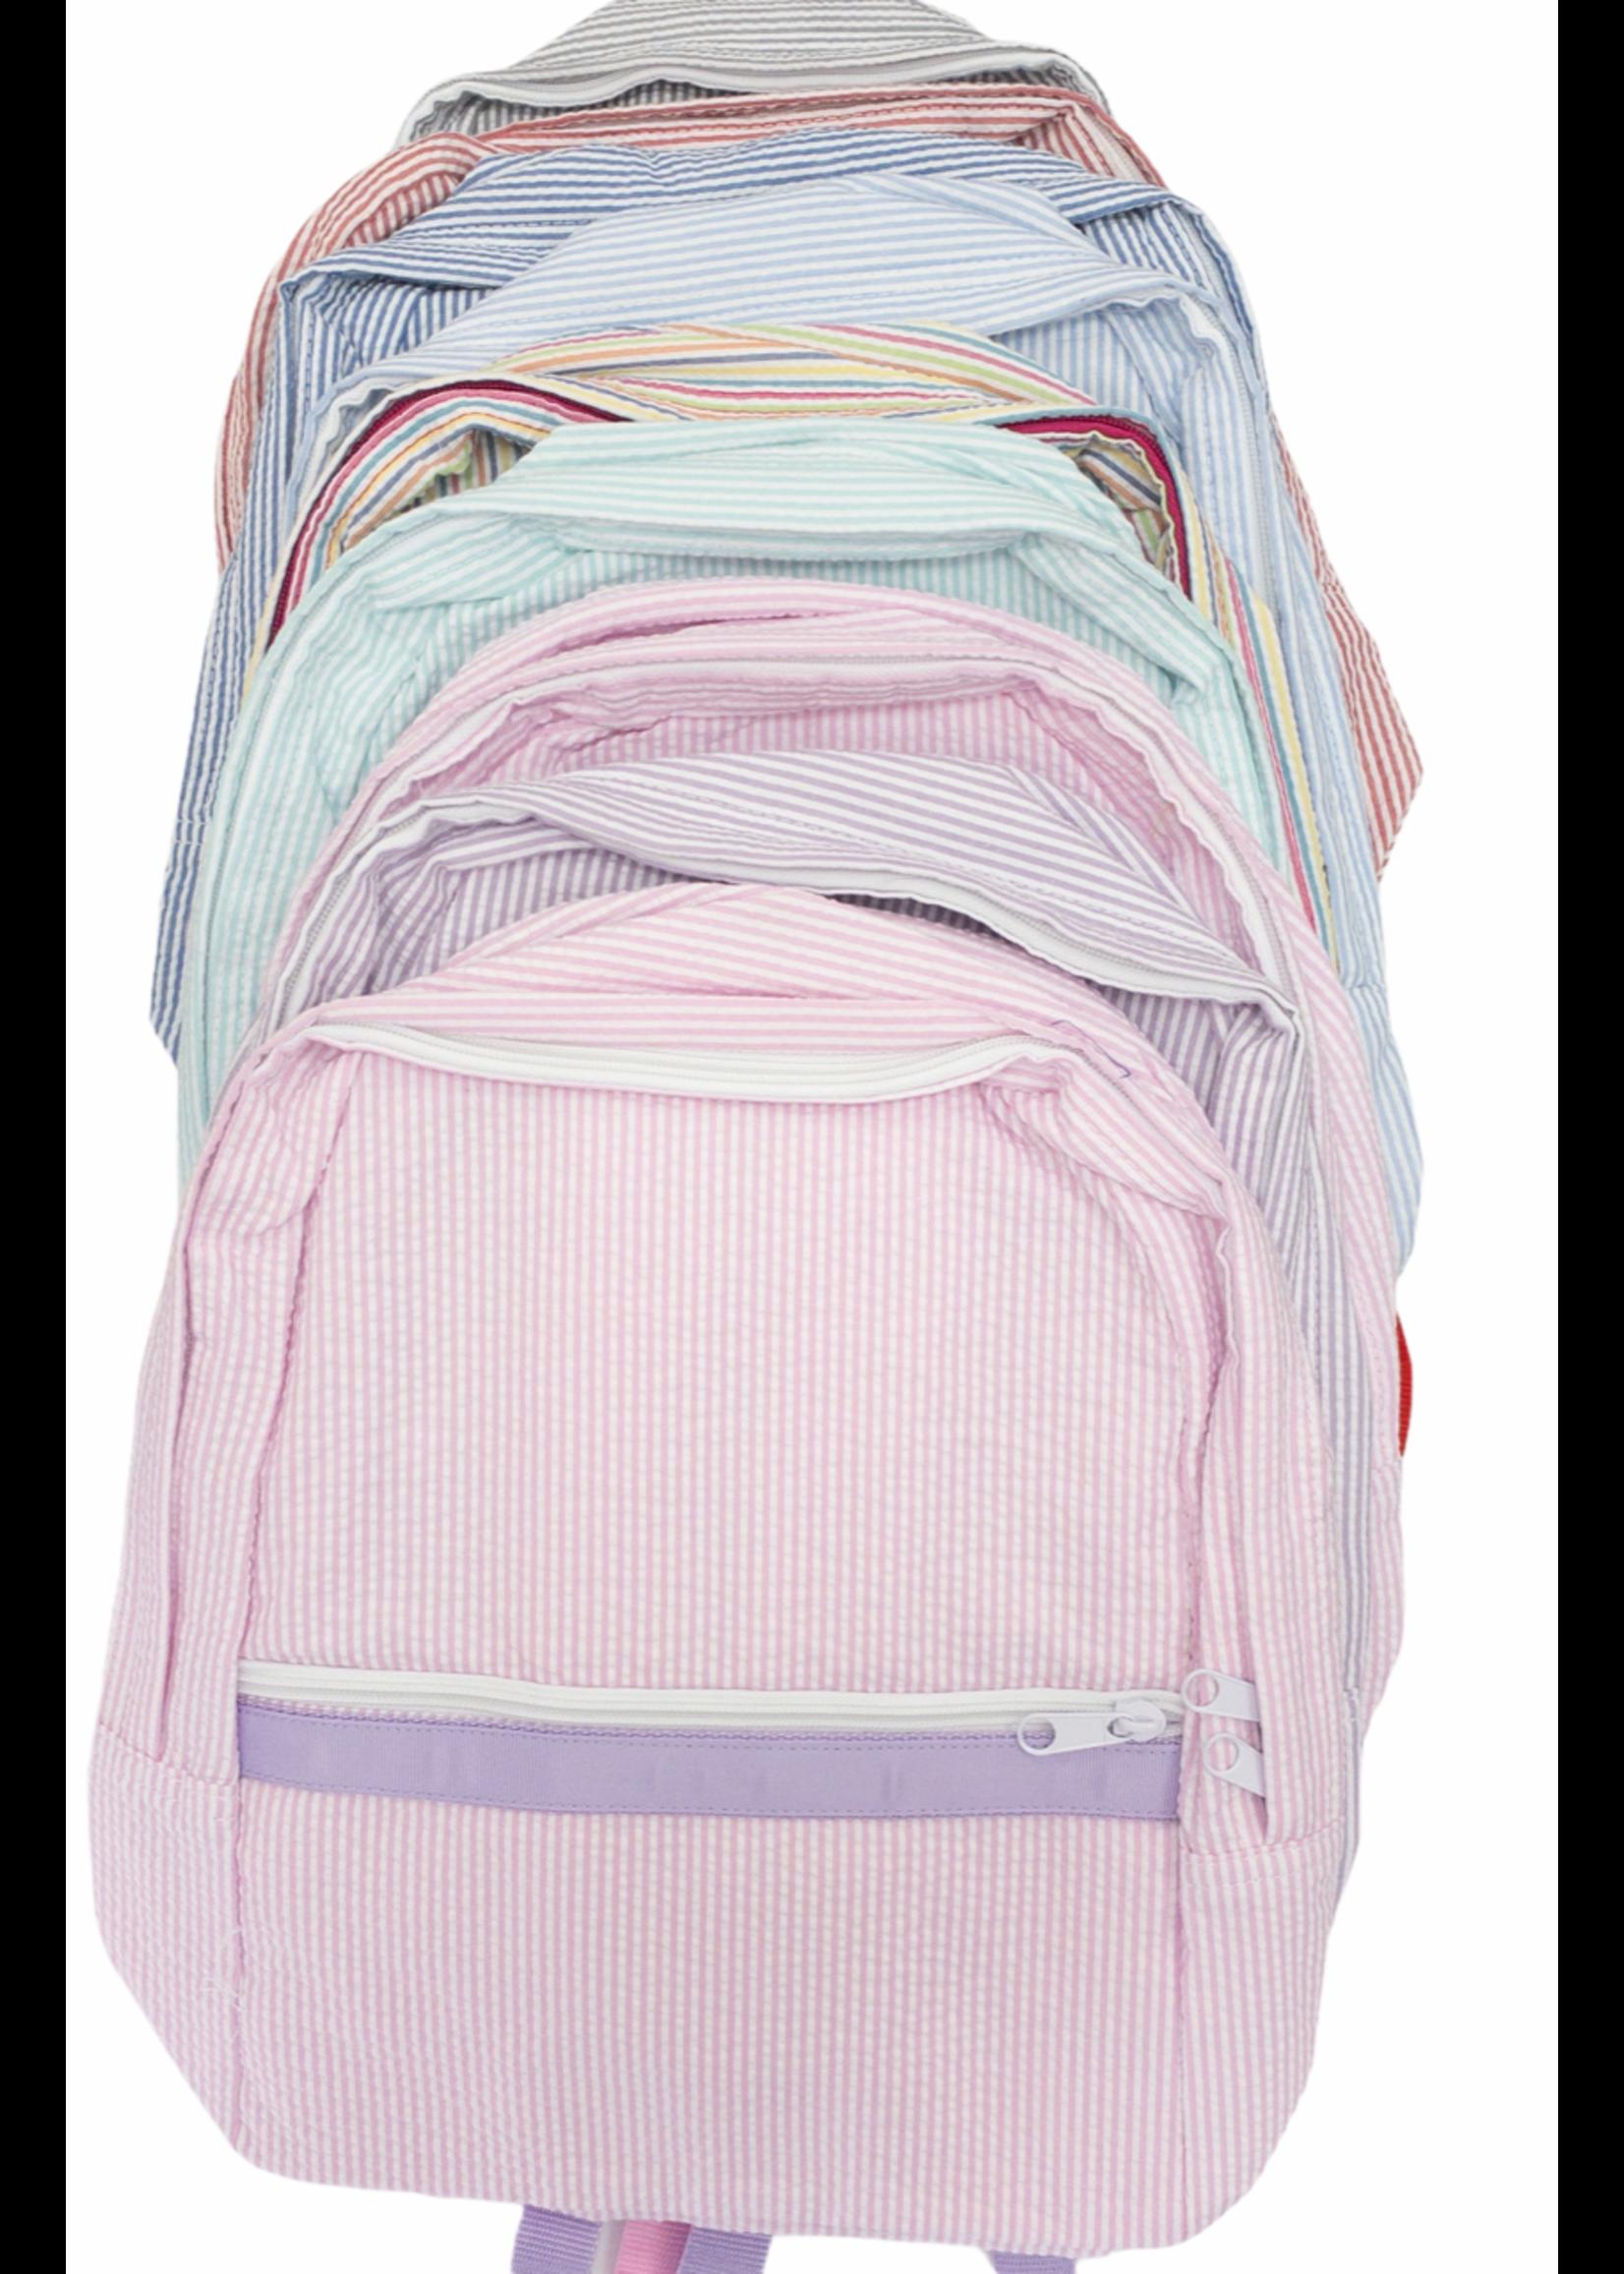 Mint Backpacks